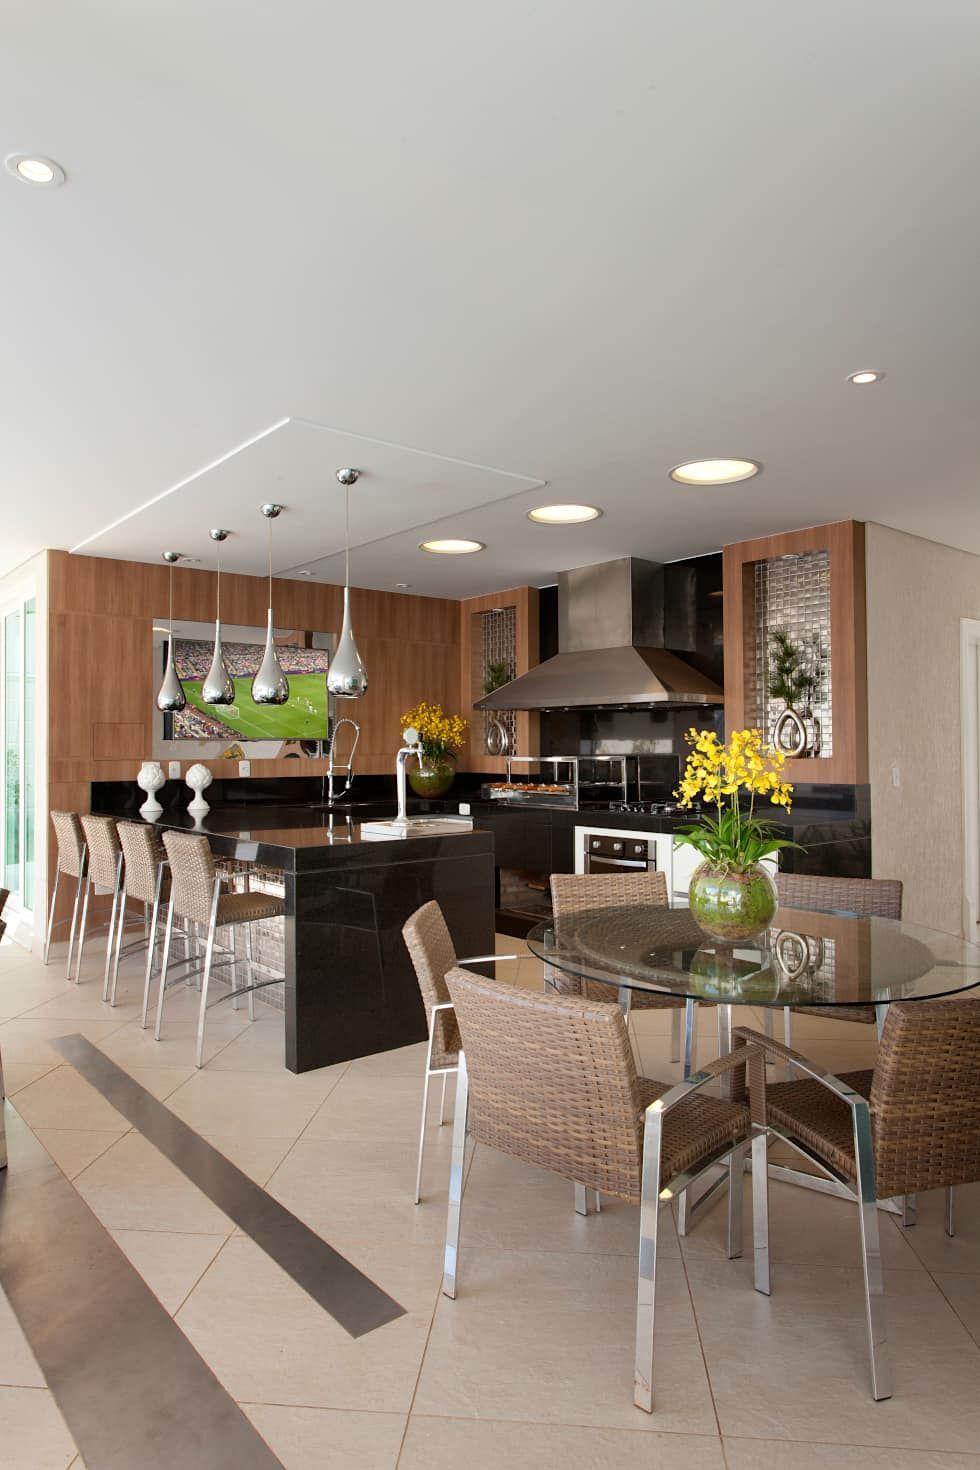 Casa Buriti: Casas Modernas Por Arquiteto Aquiles Nícolas Kílaris. Parrilla ArchitectsKitchensAt HomeFire ...